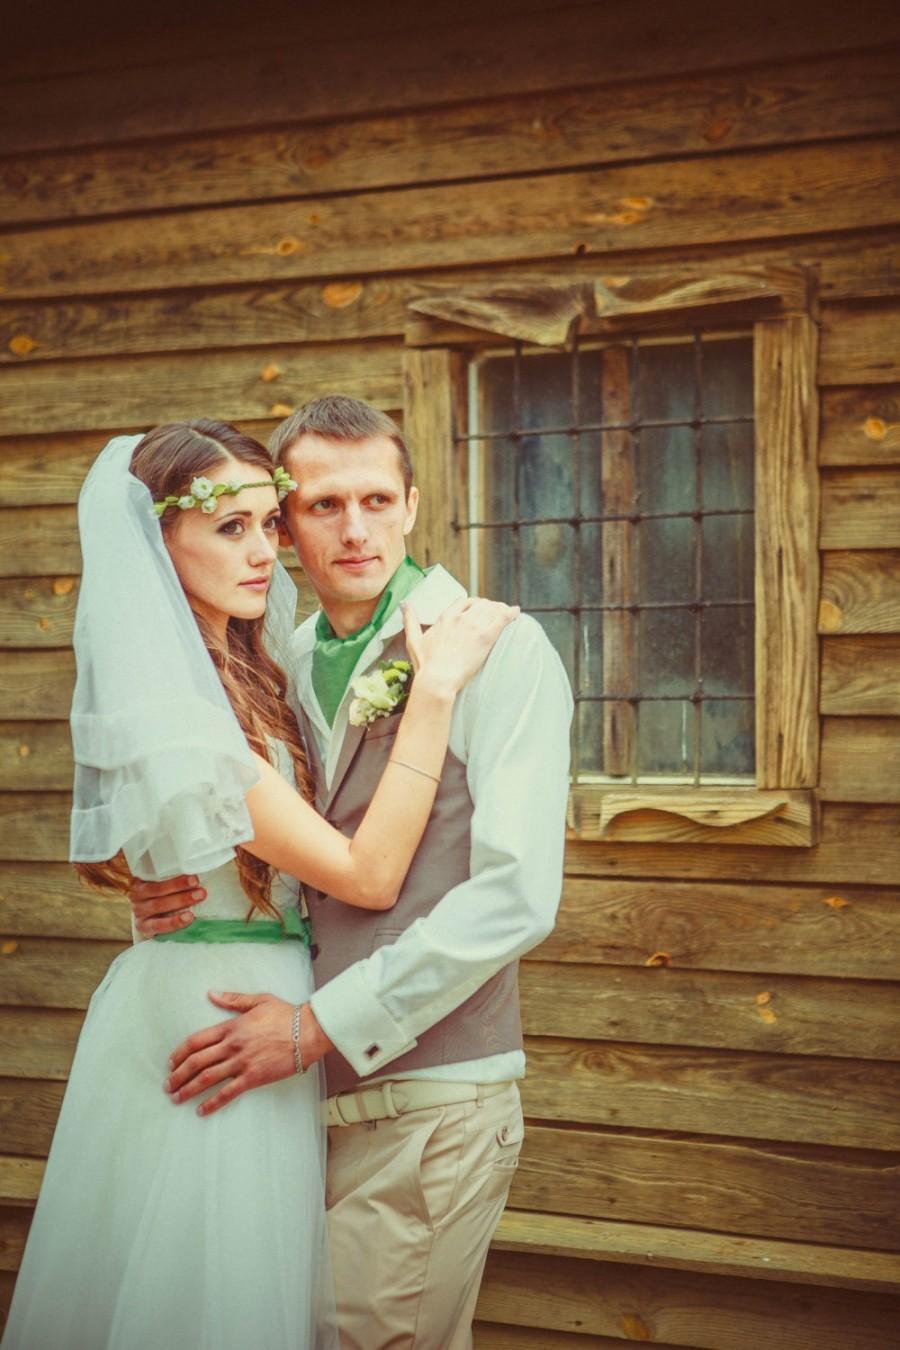 Wedding - Floral Hair Wreaths. Roses flowers crown. Hair wreath. Polymer clay flowers. Wedding headband